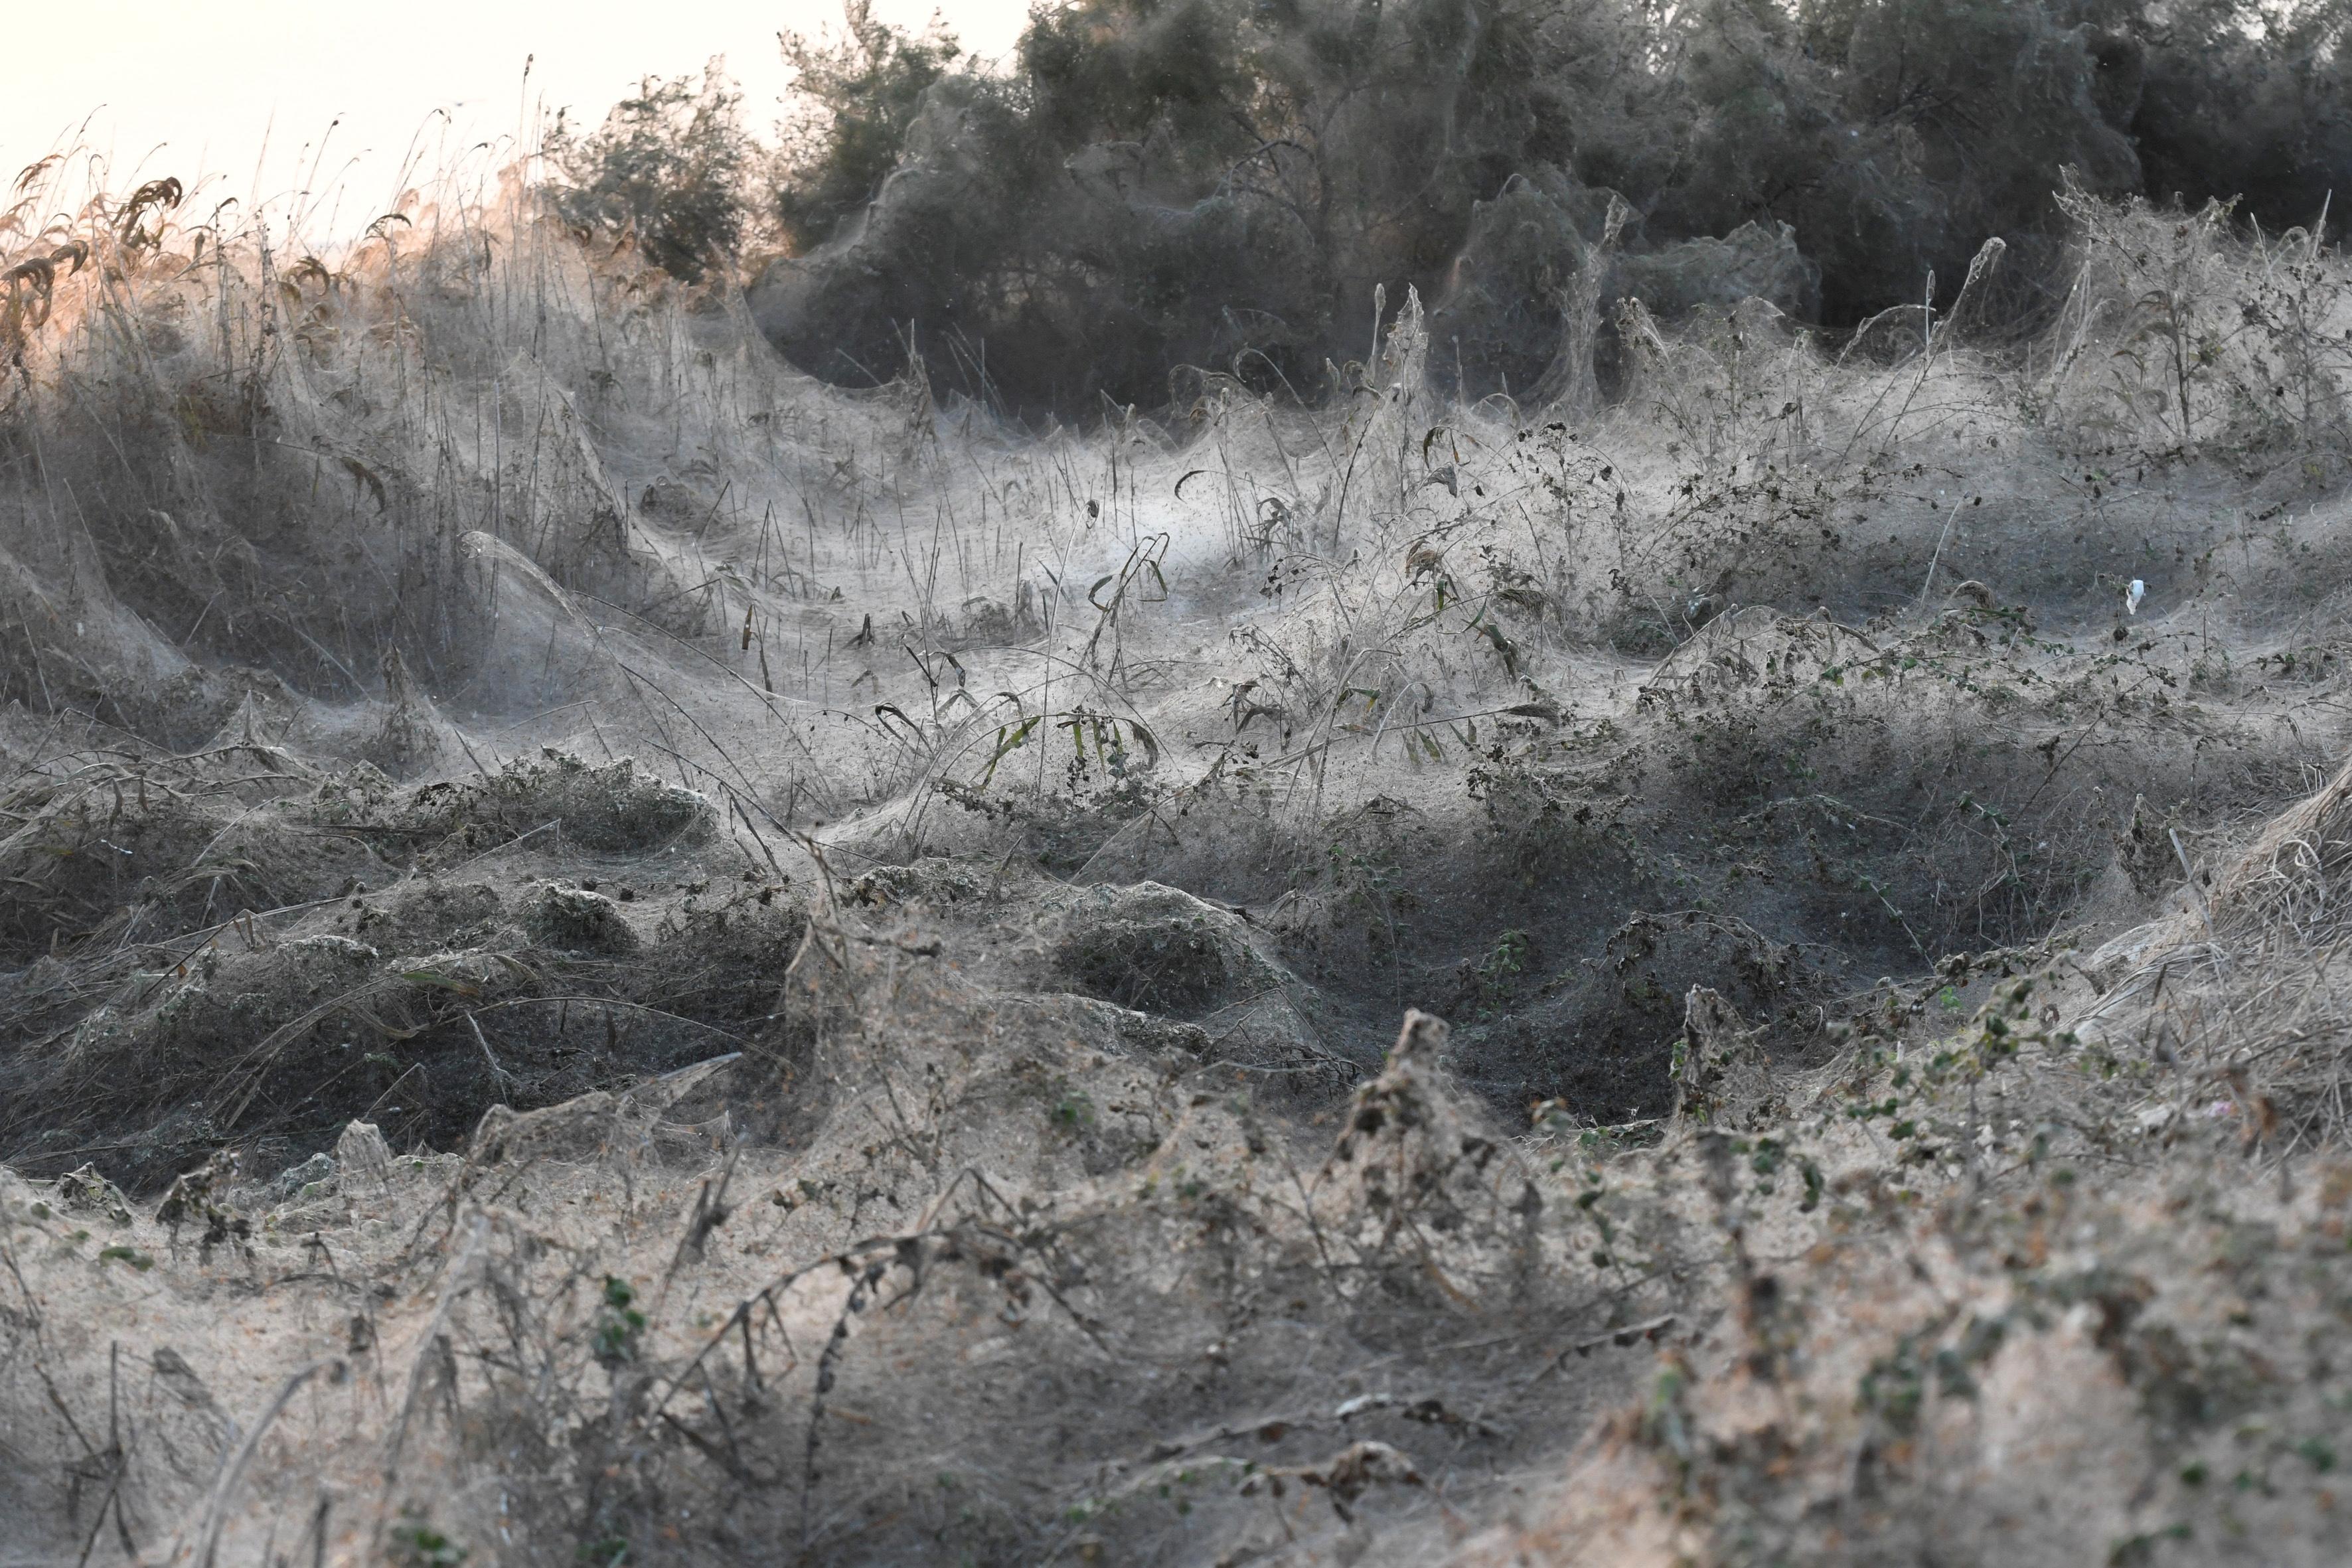 Spiderwebs blanket shrubs at the banks of Lake Vistonida, Greece, October 19, 2018. REUTERS/Alexandros Avramidis/File Photo